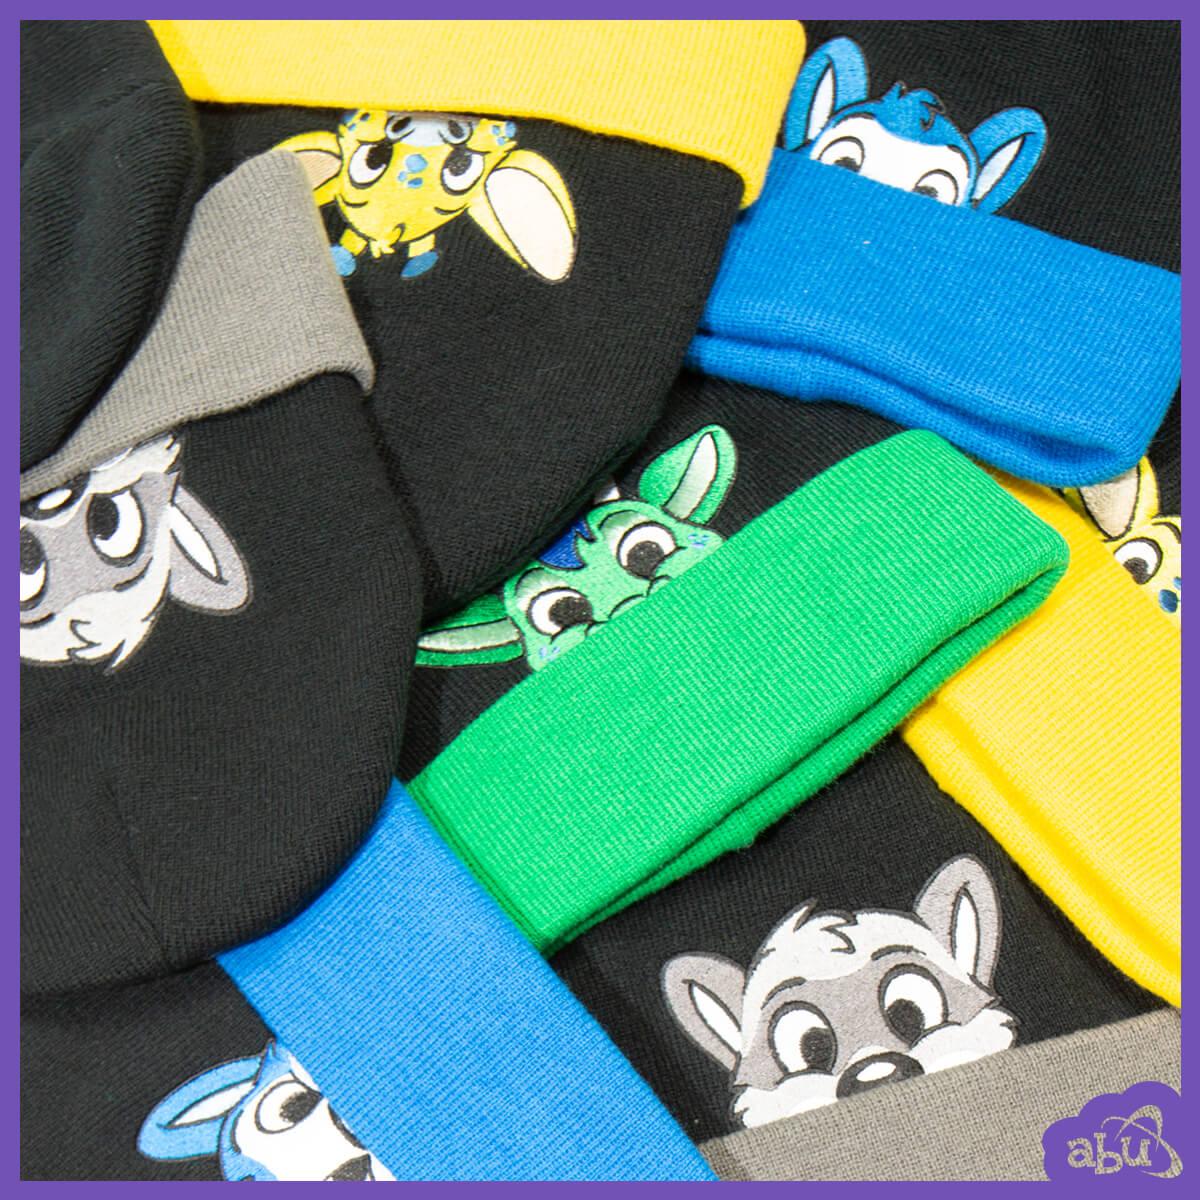 PeekABU_Knitted_Caps_Product_Image_01